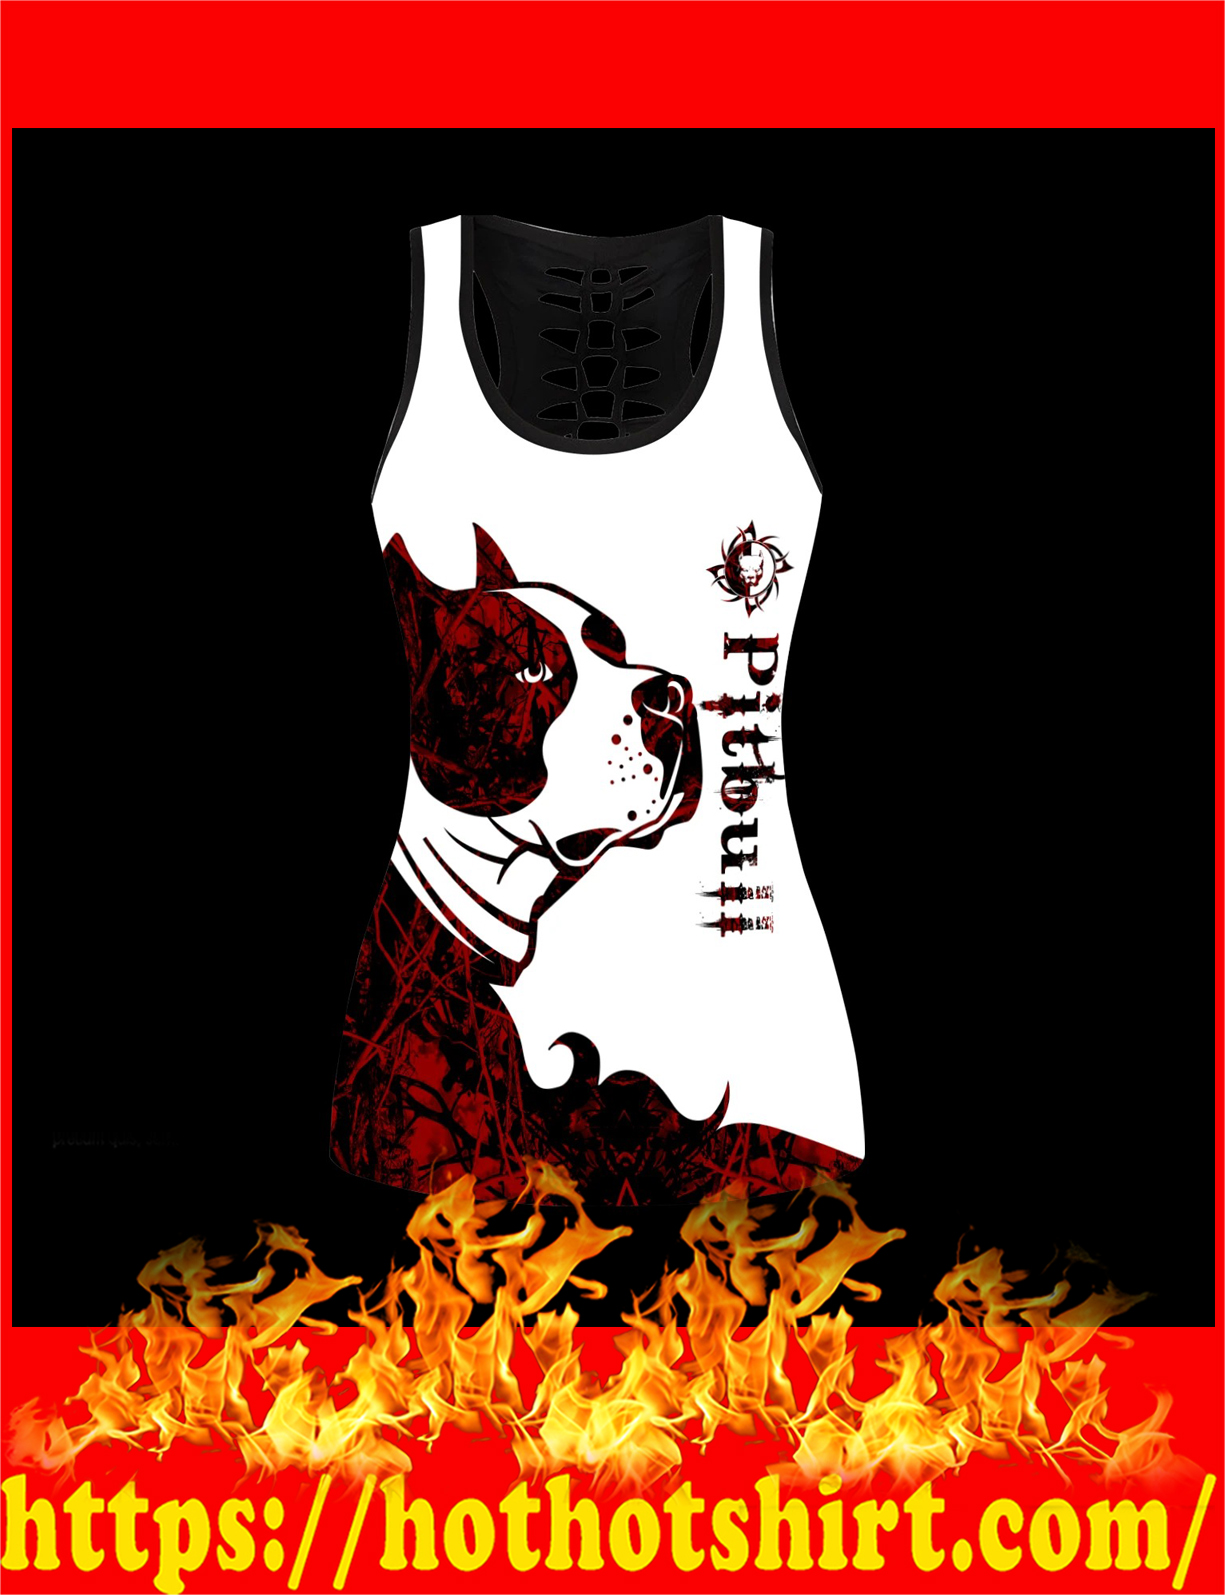 Pitbull red tattoos legging and hollow tank 1